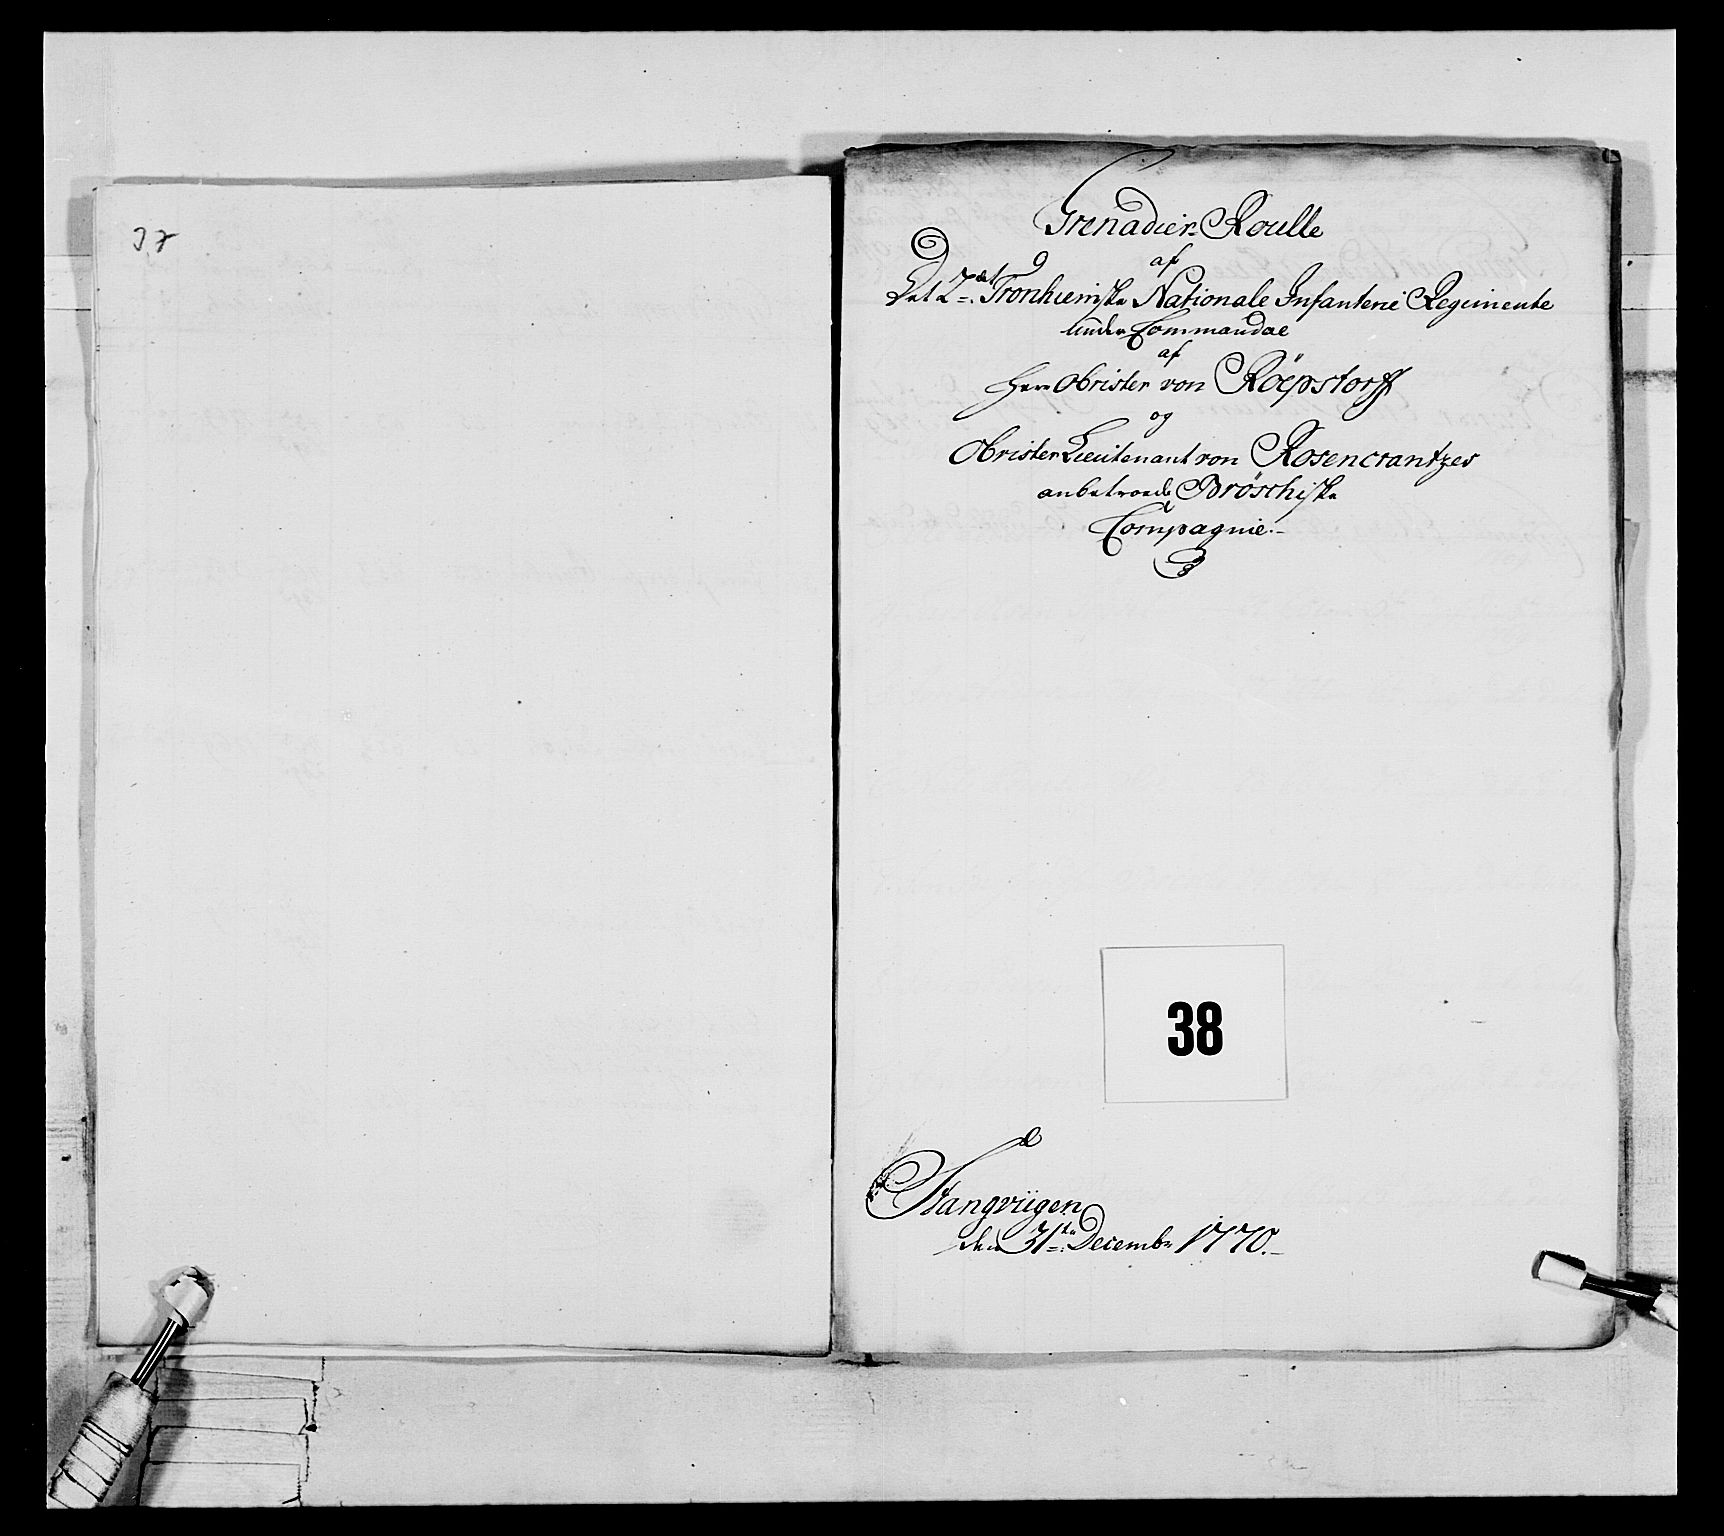 RA, Generalitets- og kommissariatskollegiet, Det kongelige norske kommissariatskollegium, E/Eh/L0076: 2. Trondheimske nasjonale infanteriregiment, 1766-1773, p. 116